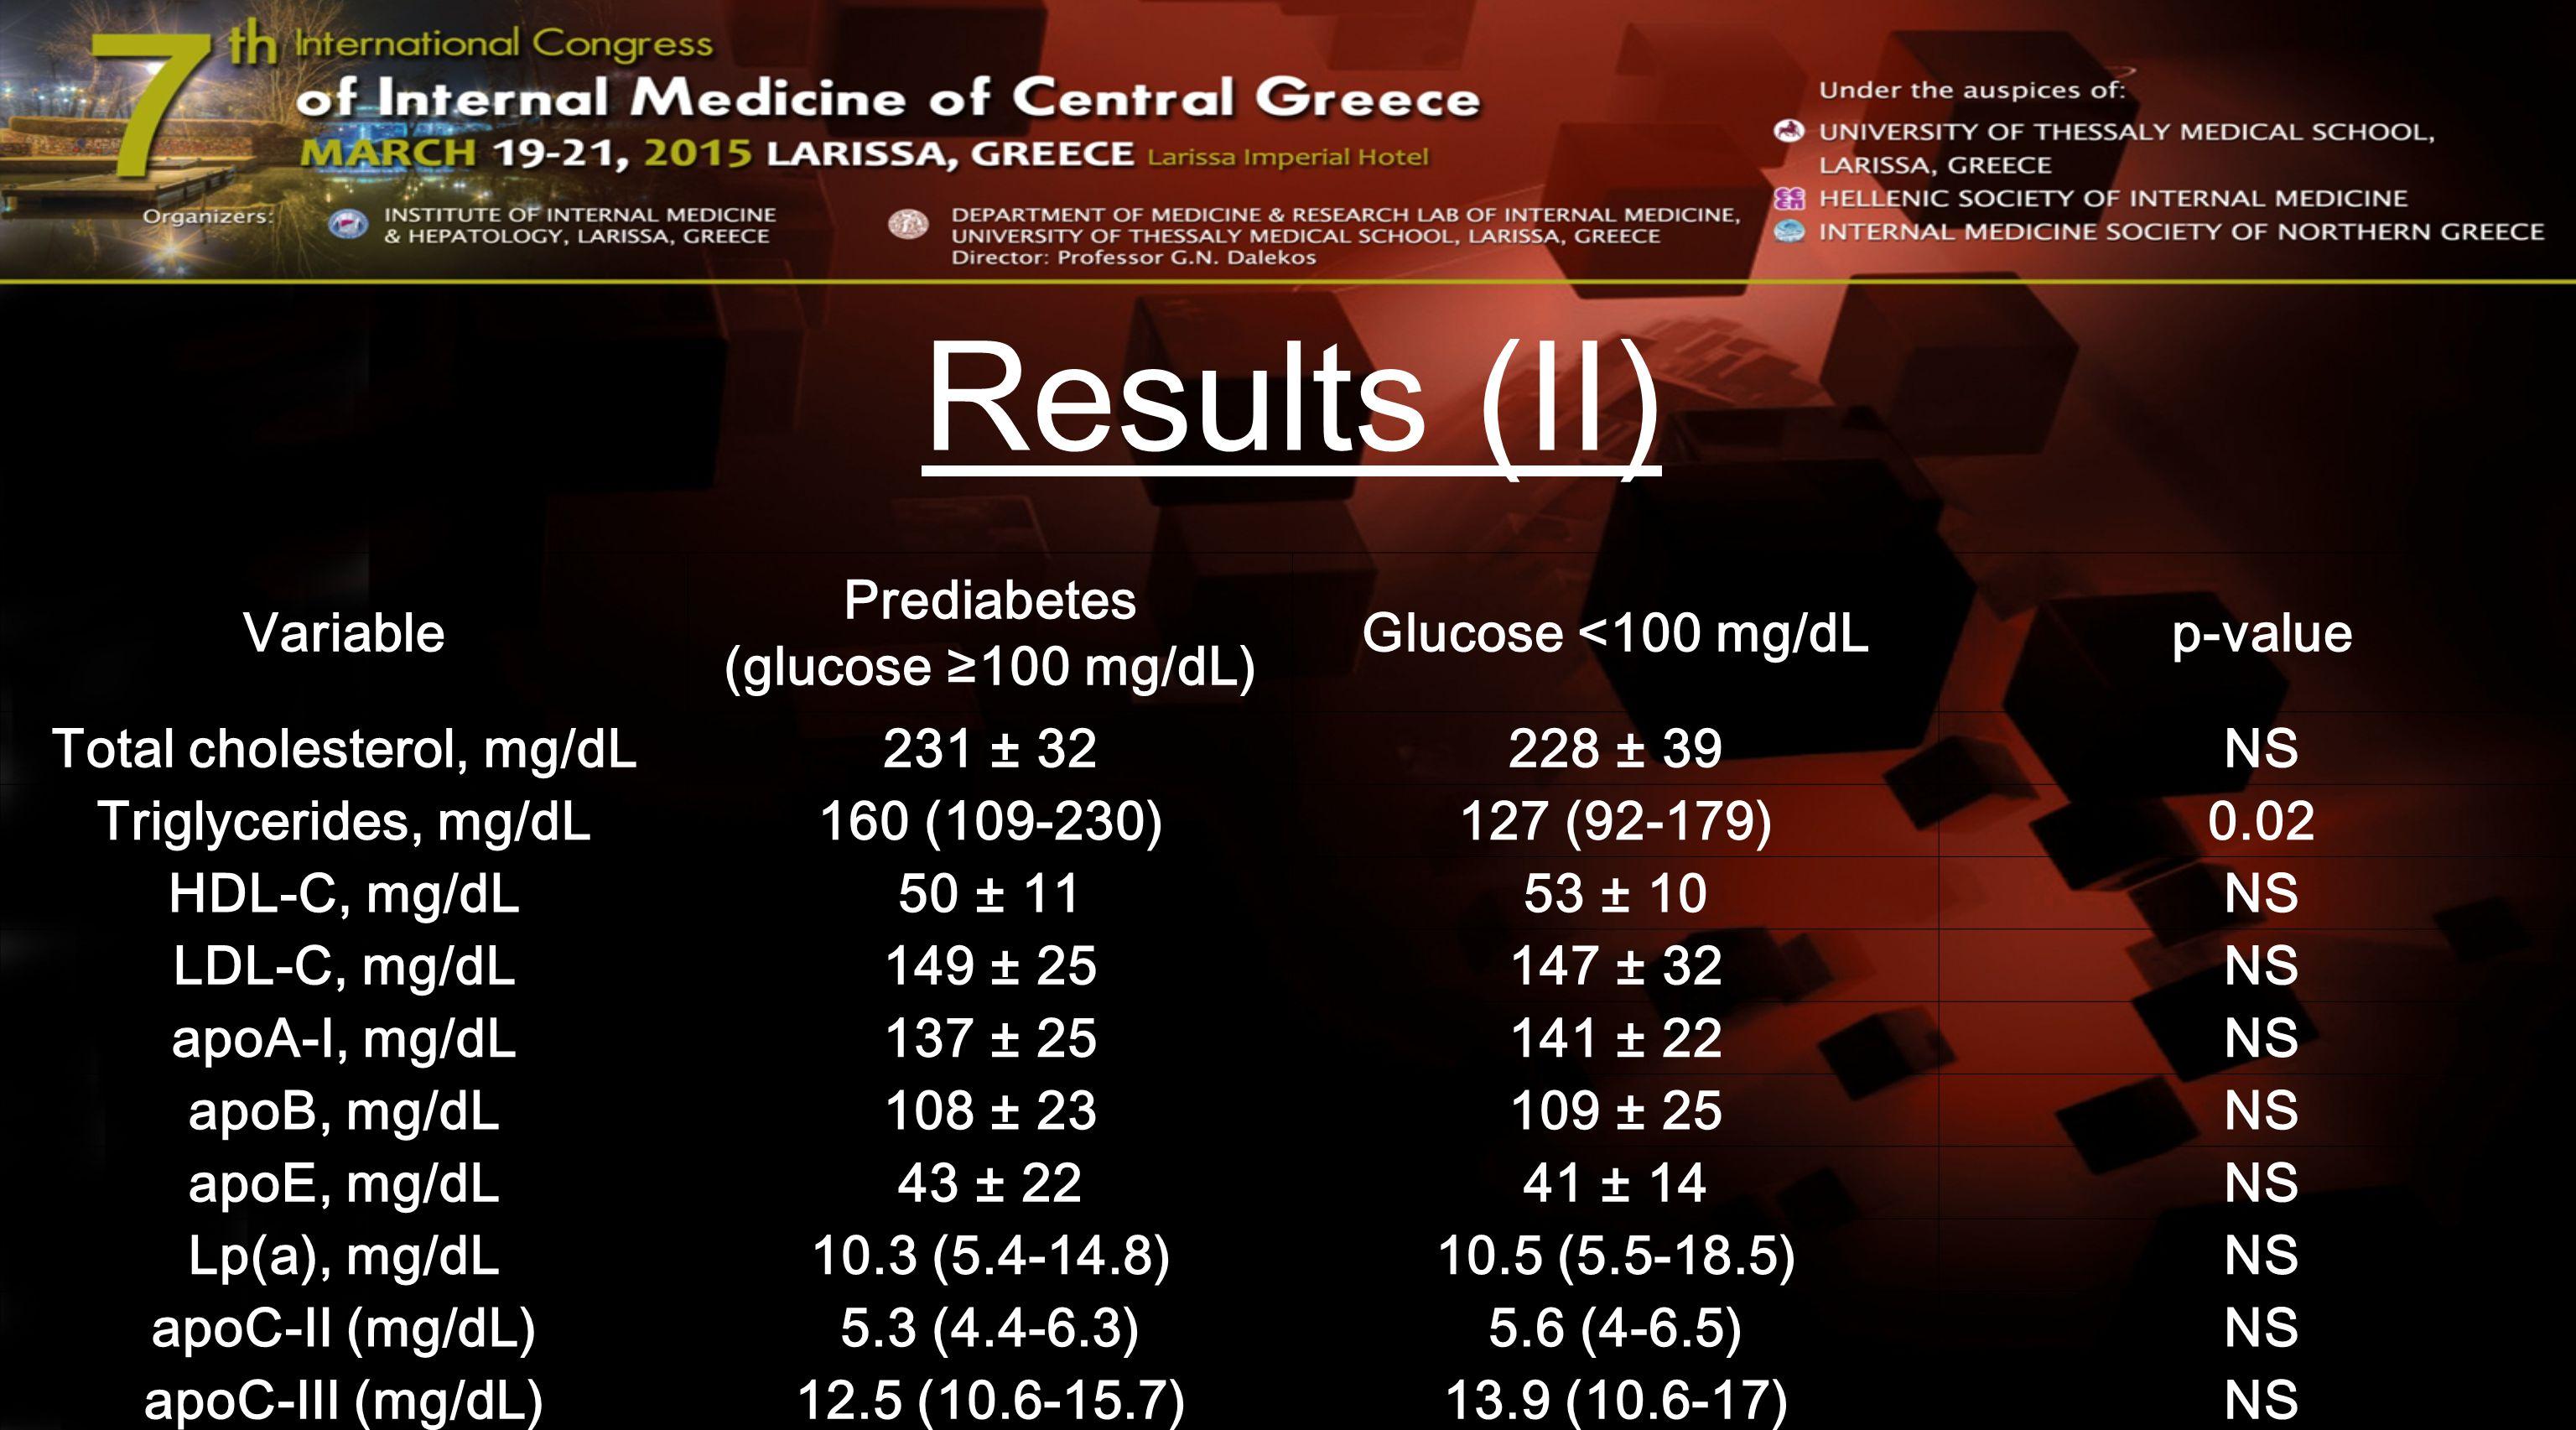 Results (III) Variable IFG (glucose ≥100 mg/dL) Glucose <100 mg/dLp-value sdLDL-C, mg/dL10 (4-22)8 (3-18)NS (0.08) sdLDL, %7.6 (2.7-18.6)6.0 (1.8-15.1)NS (0.09) LDL size, Å267 (260-270)267 (261-271)NS Large HDL2, mg/dL14 (9-19)15 (12-20)NS Small HDL3, mg/dL37 (31-42)36 (31-43)NS Small HDL3, %73 (65-80)69 (60-77)0.03 LpPLA 2 activity, nmol/mL/min 55 (44-66)52 (46-62)NS HDL-LpPLA 2 activity, nmol/mL/min 2.35 (1.7-3.3)2.9 (2.0-3.7)0.016 PON1 (paraoxon), U/L57 (40-106)65 (41-136)NS PON1 (arylesterase), U/mL46 (33-62)43 (35-59)NS